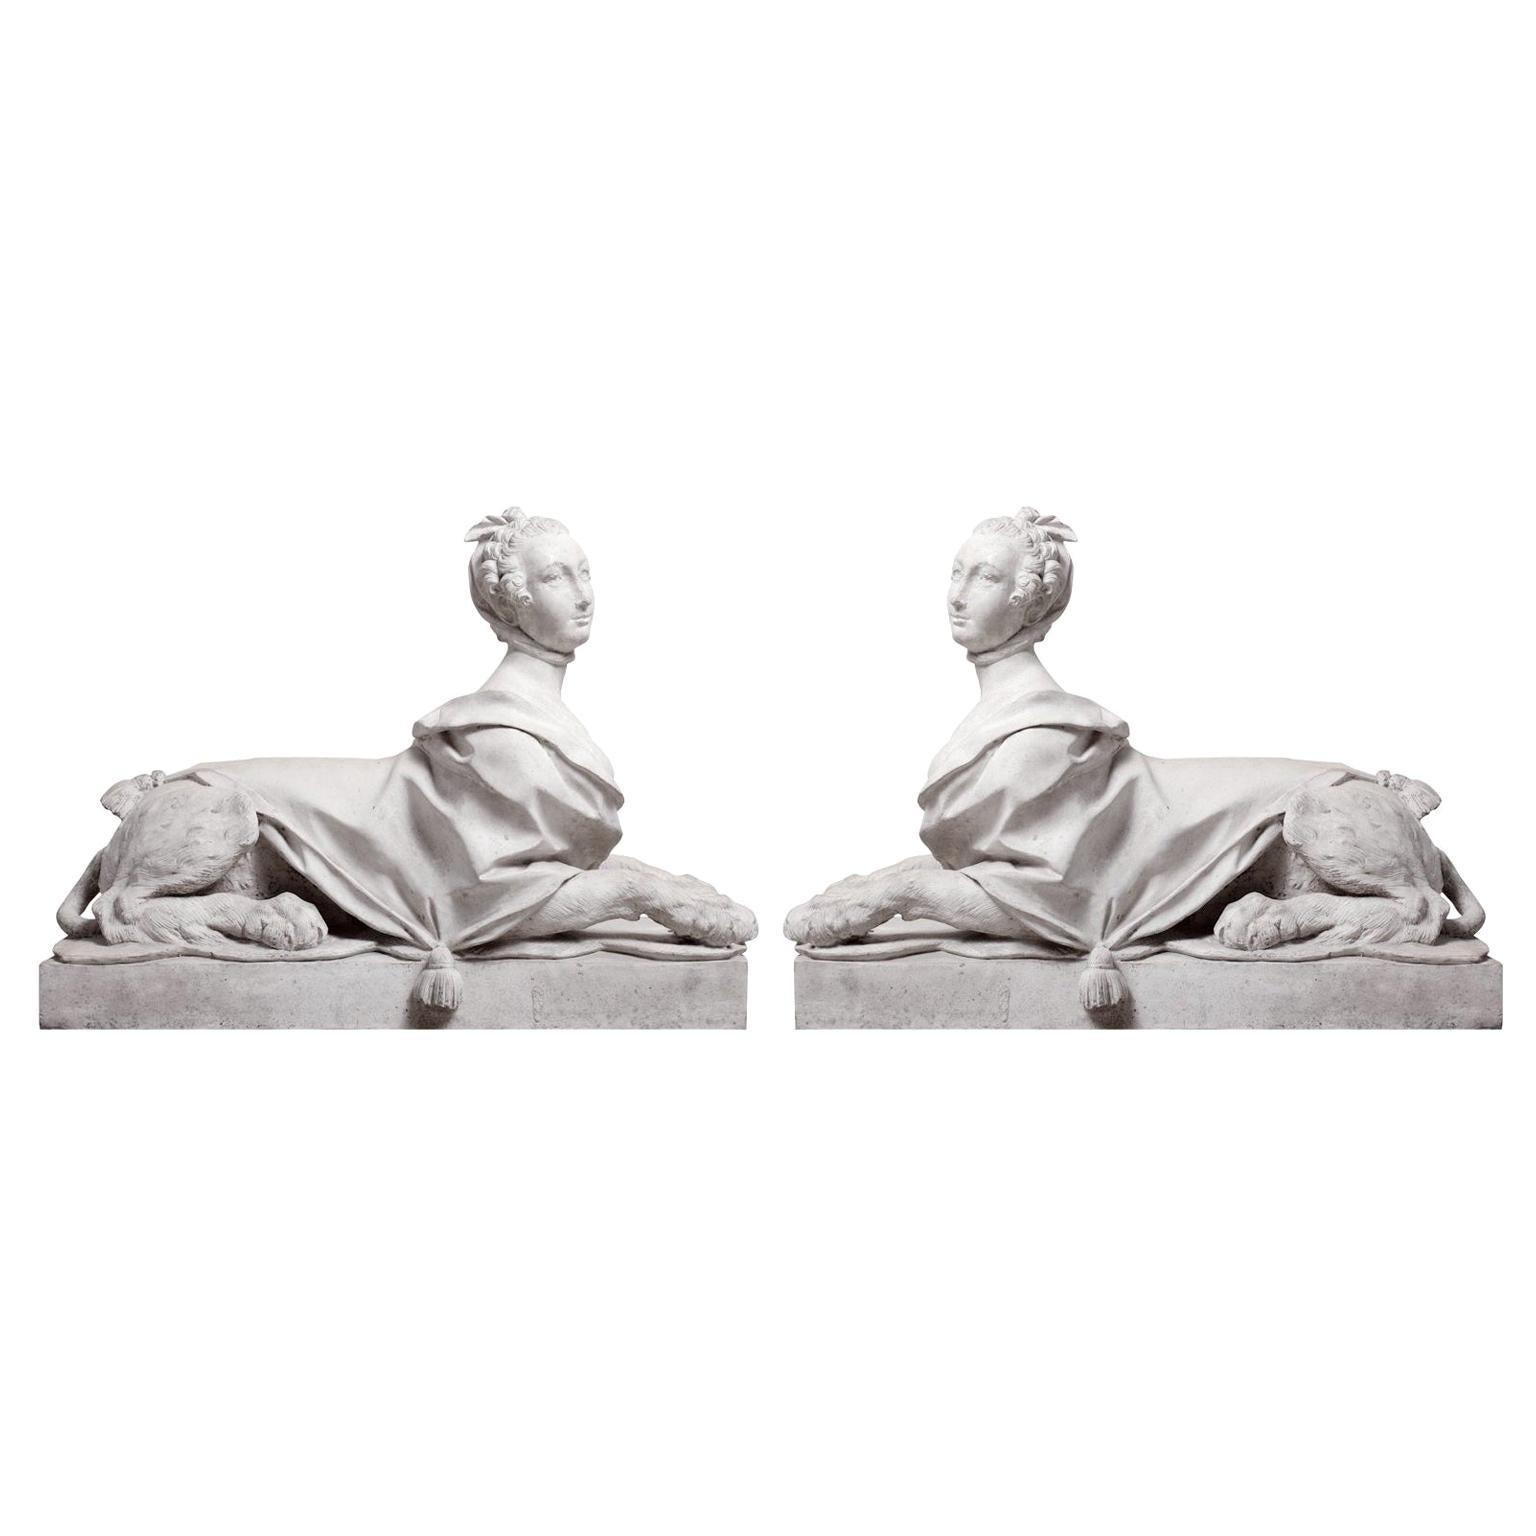 Pair of Louis XV Style Sculpture of Madame de Pompadour as Sphinxes